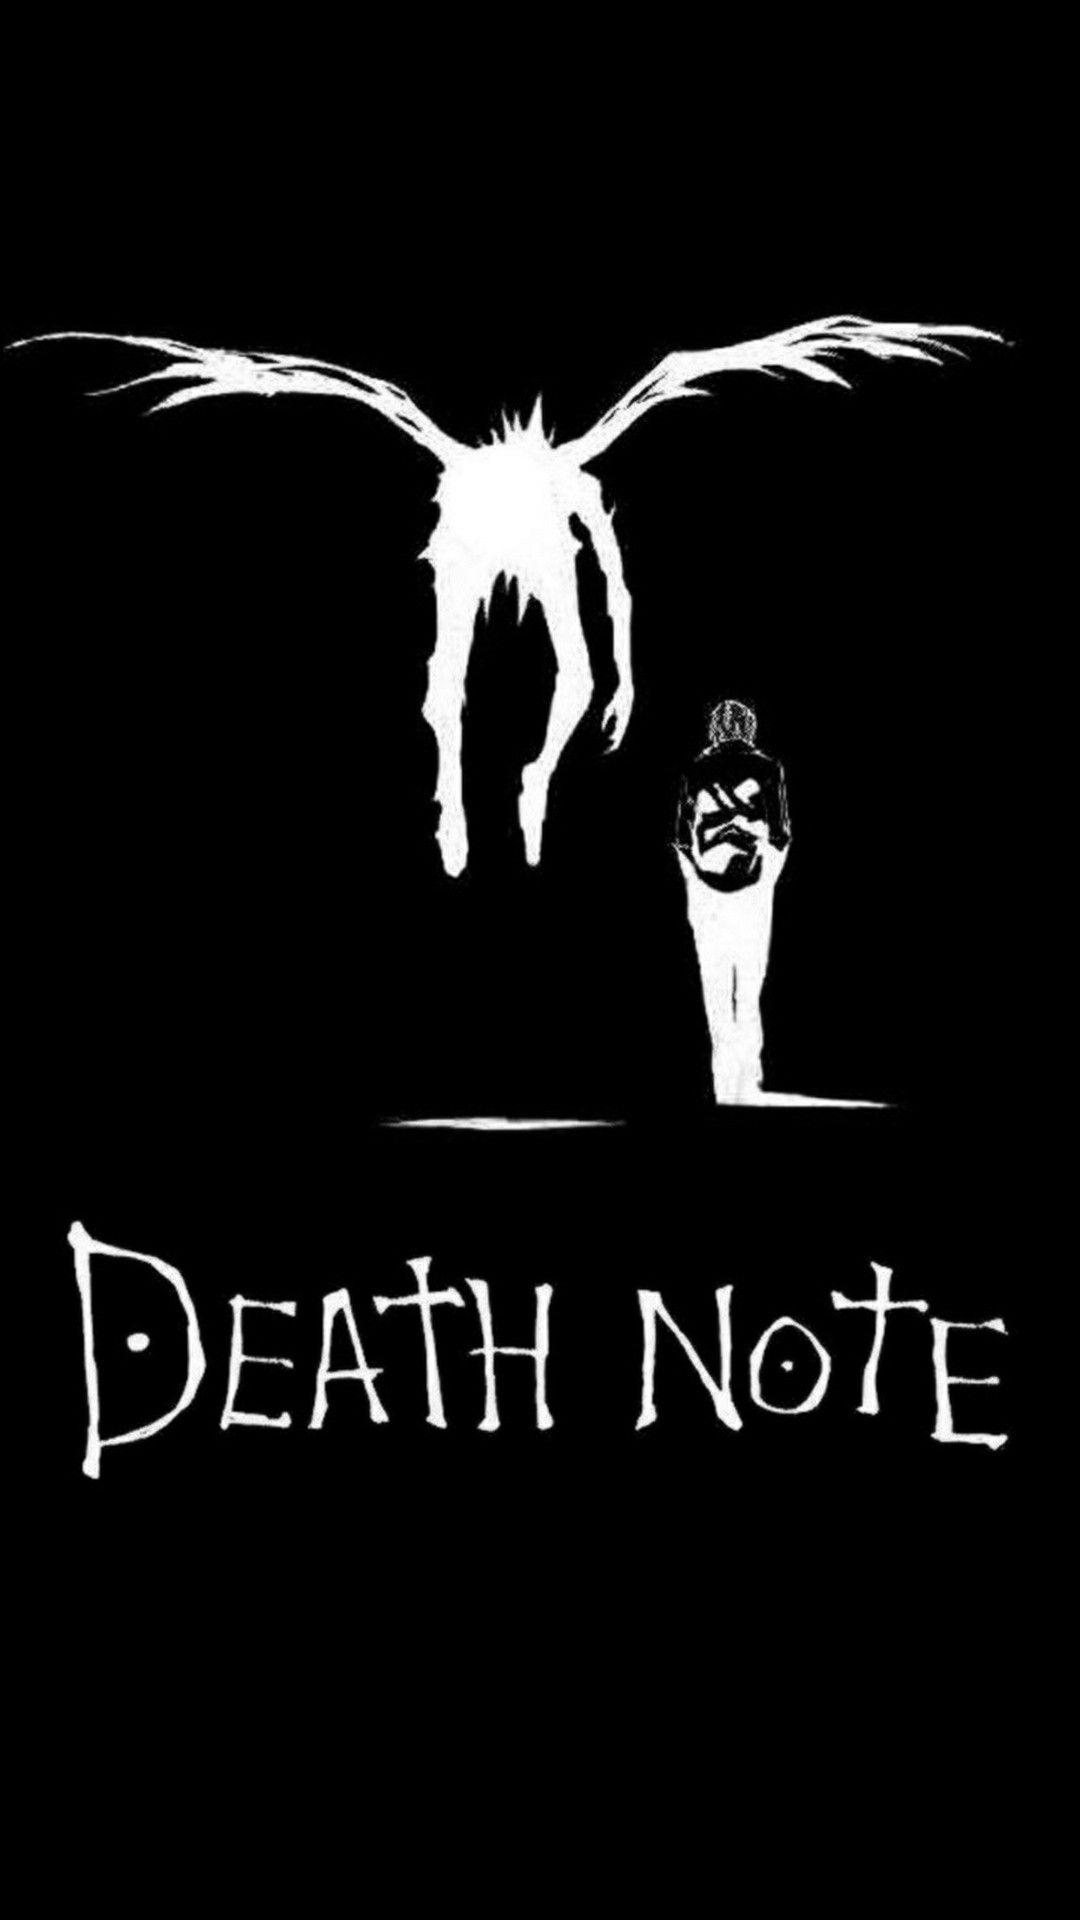 kunstplakate death note poster 01